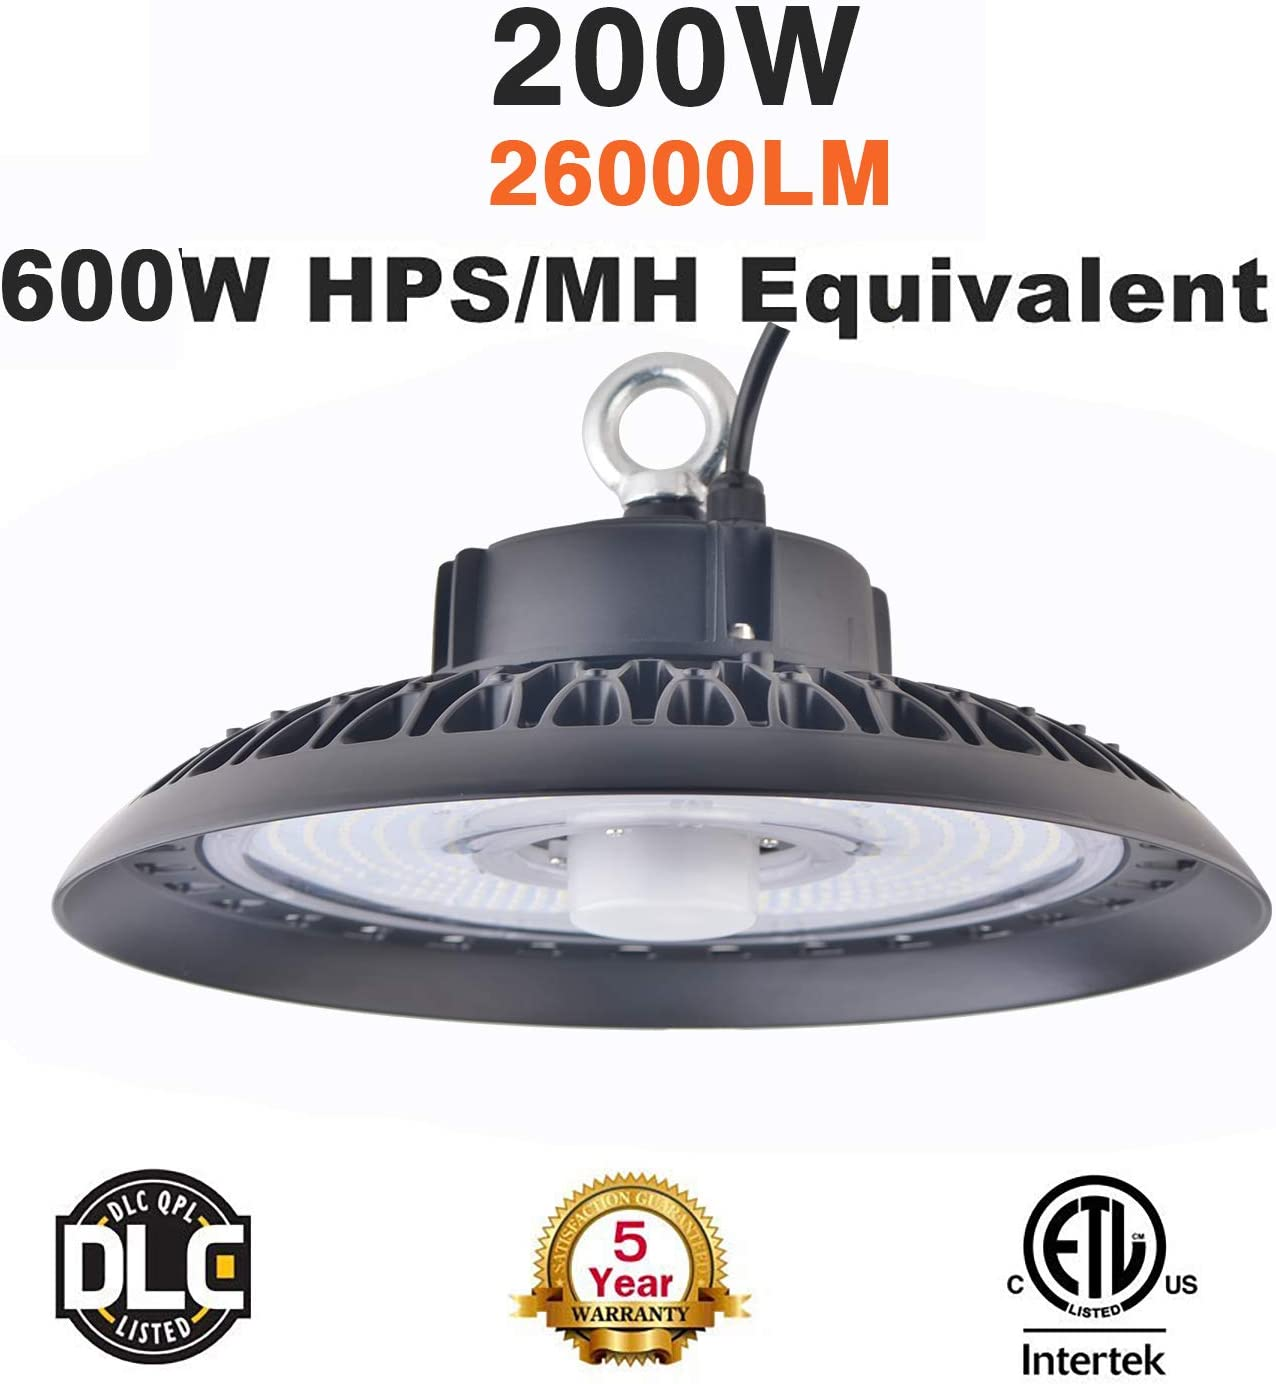 100W 150W 200W UFO High Bay LED Light Dimmable Fixture IP65 5000K Motion Sensor